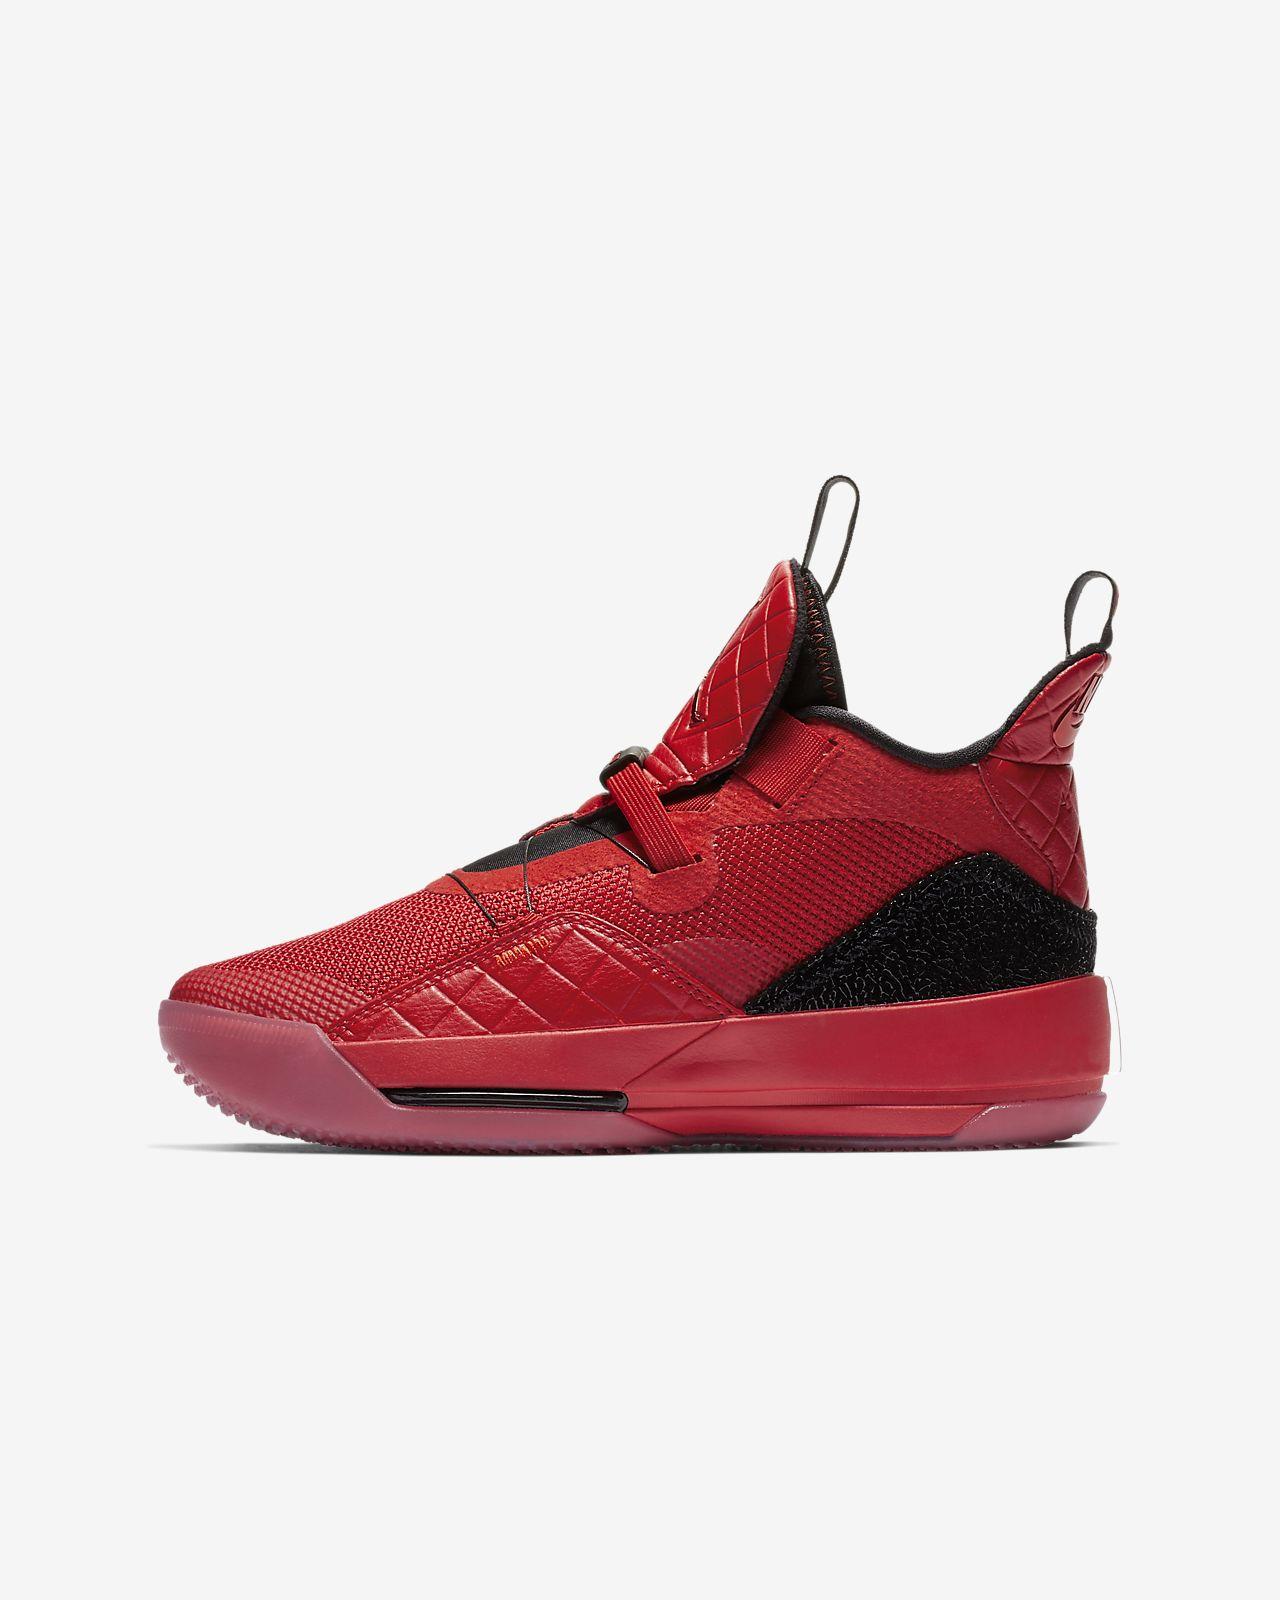 9af170950199c Scarpa da basket Air Jordan XXXIII - Ragazzi. Nike.com IT